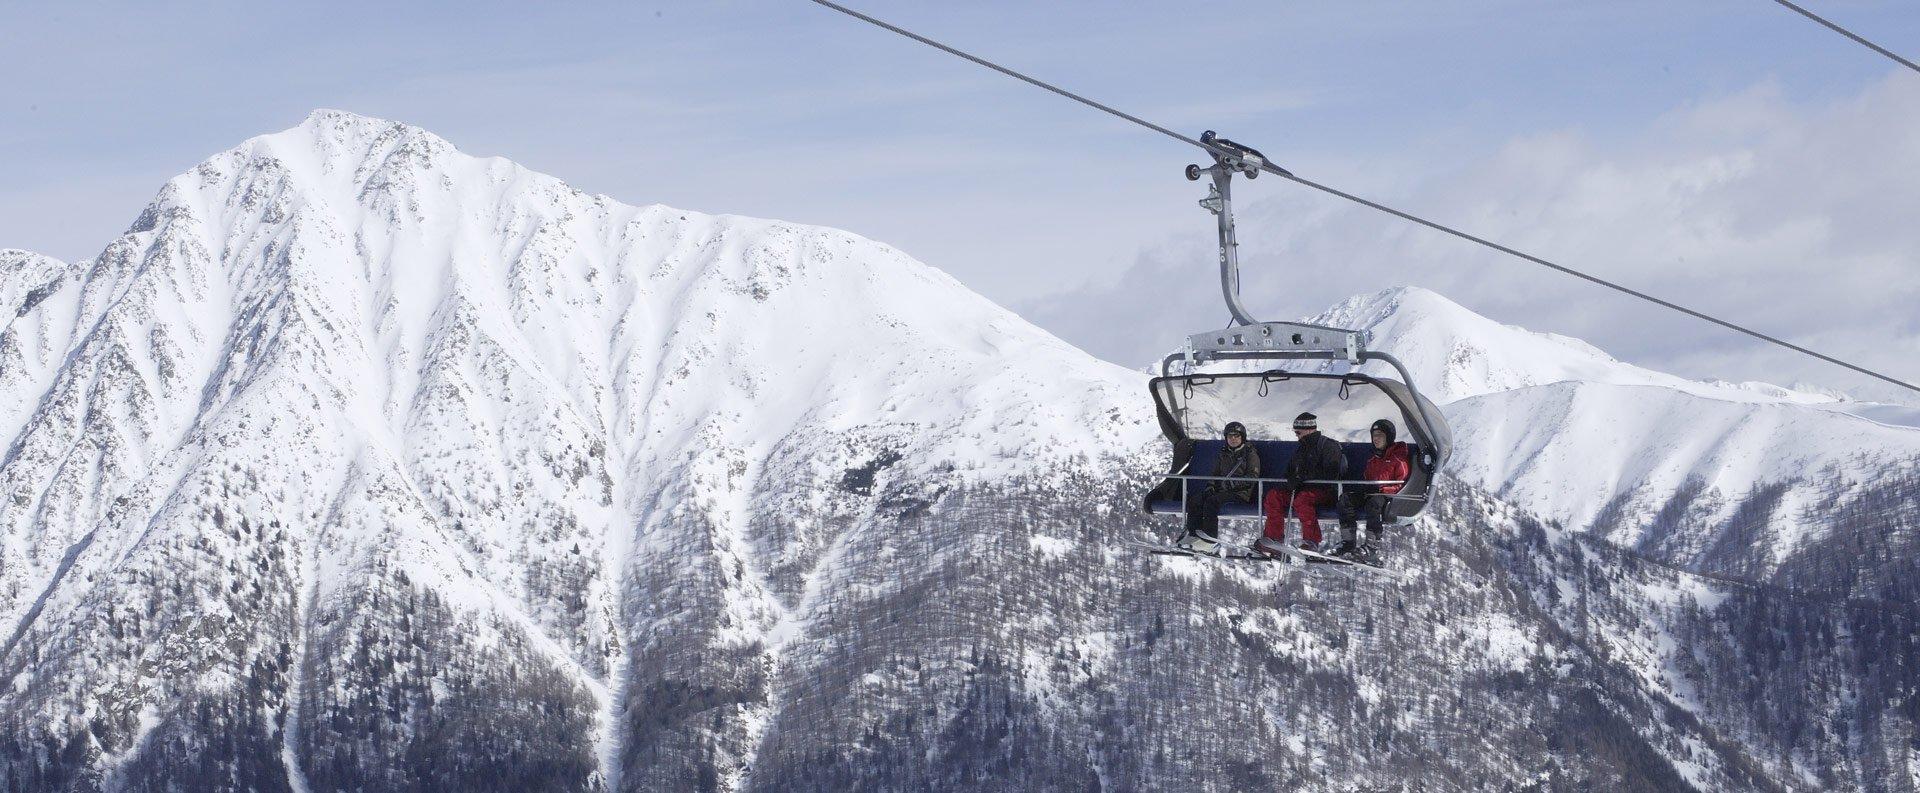 skiurlaub-meransen-03